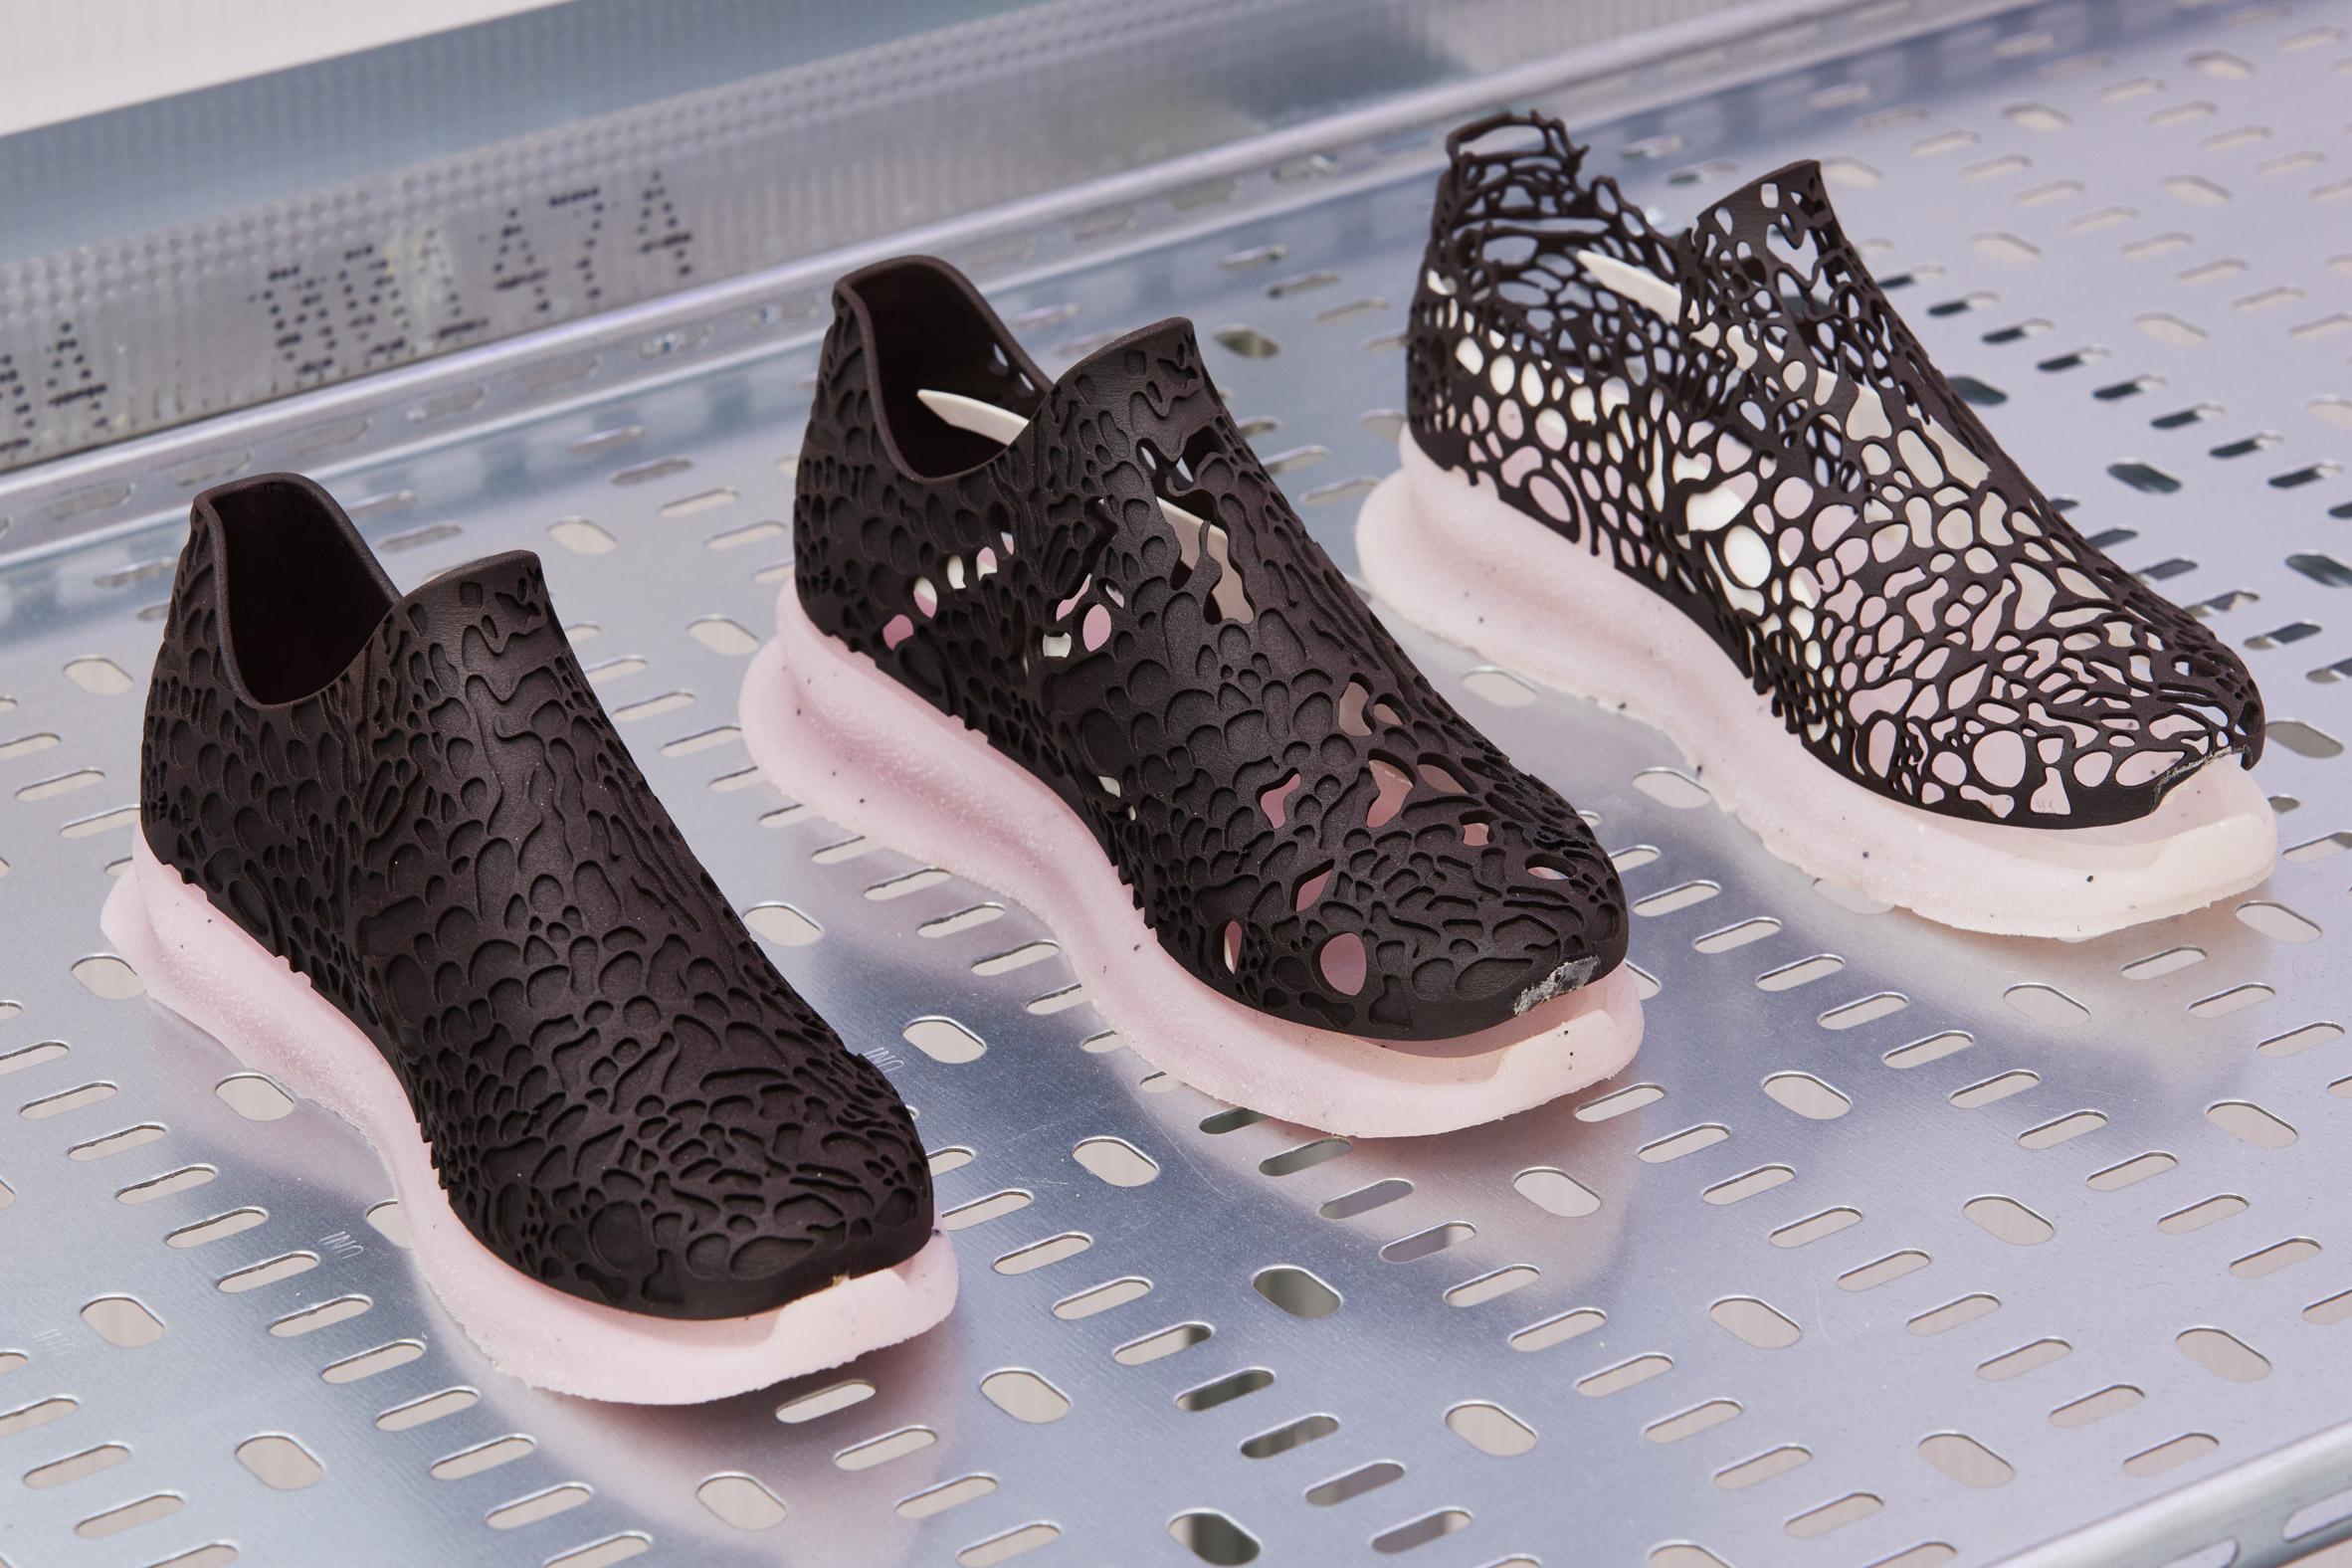 PUMA x MIT Design Lab x Biorealize Breathing Shoe